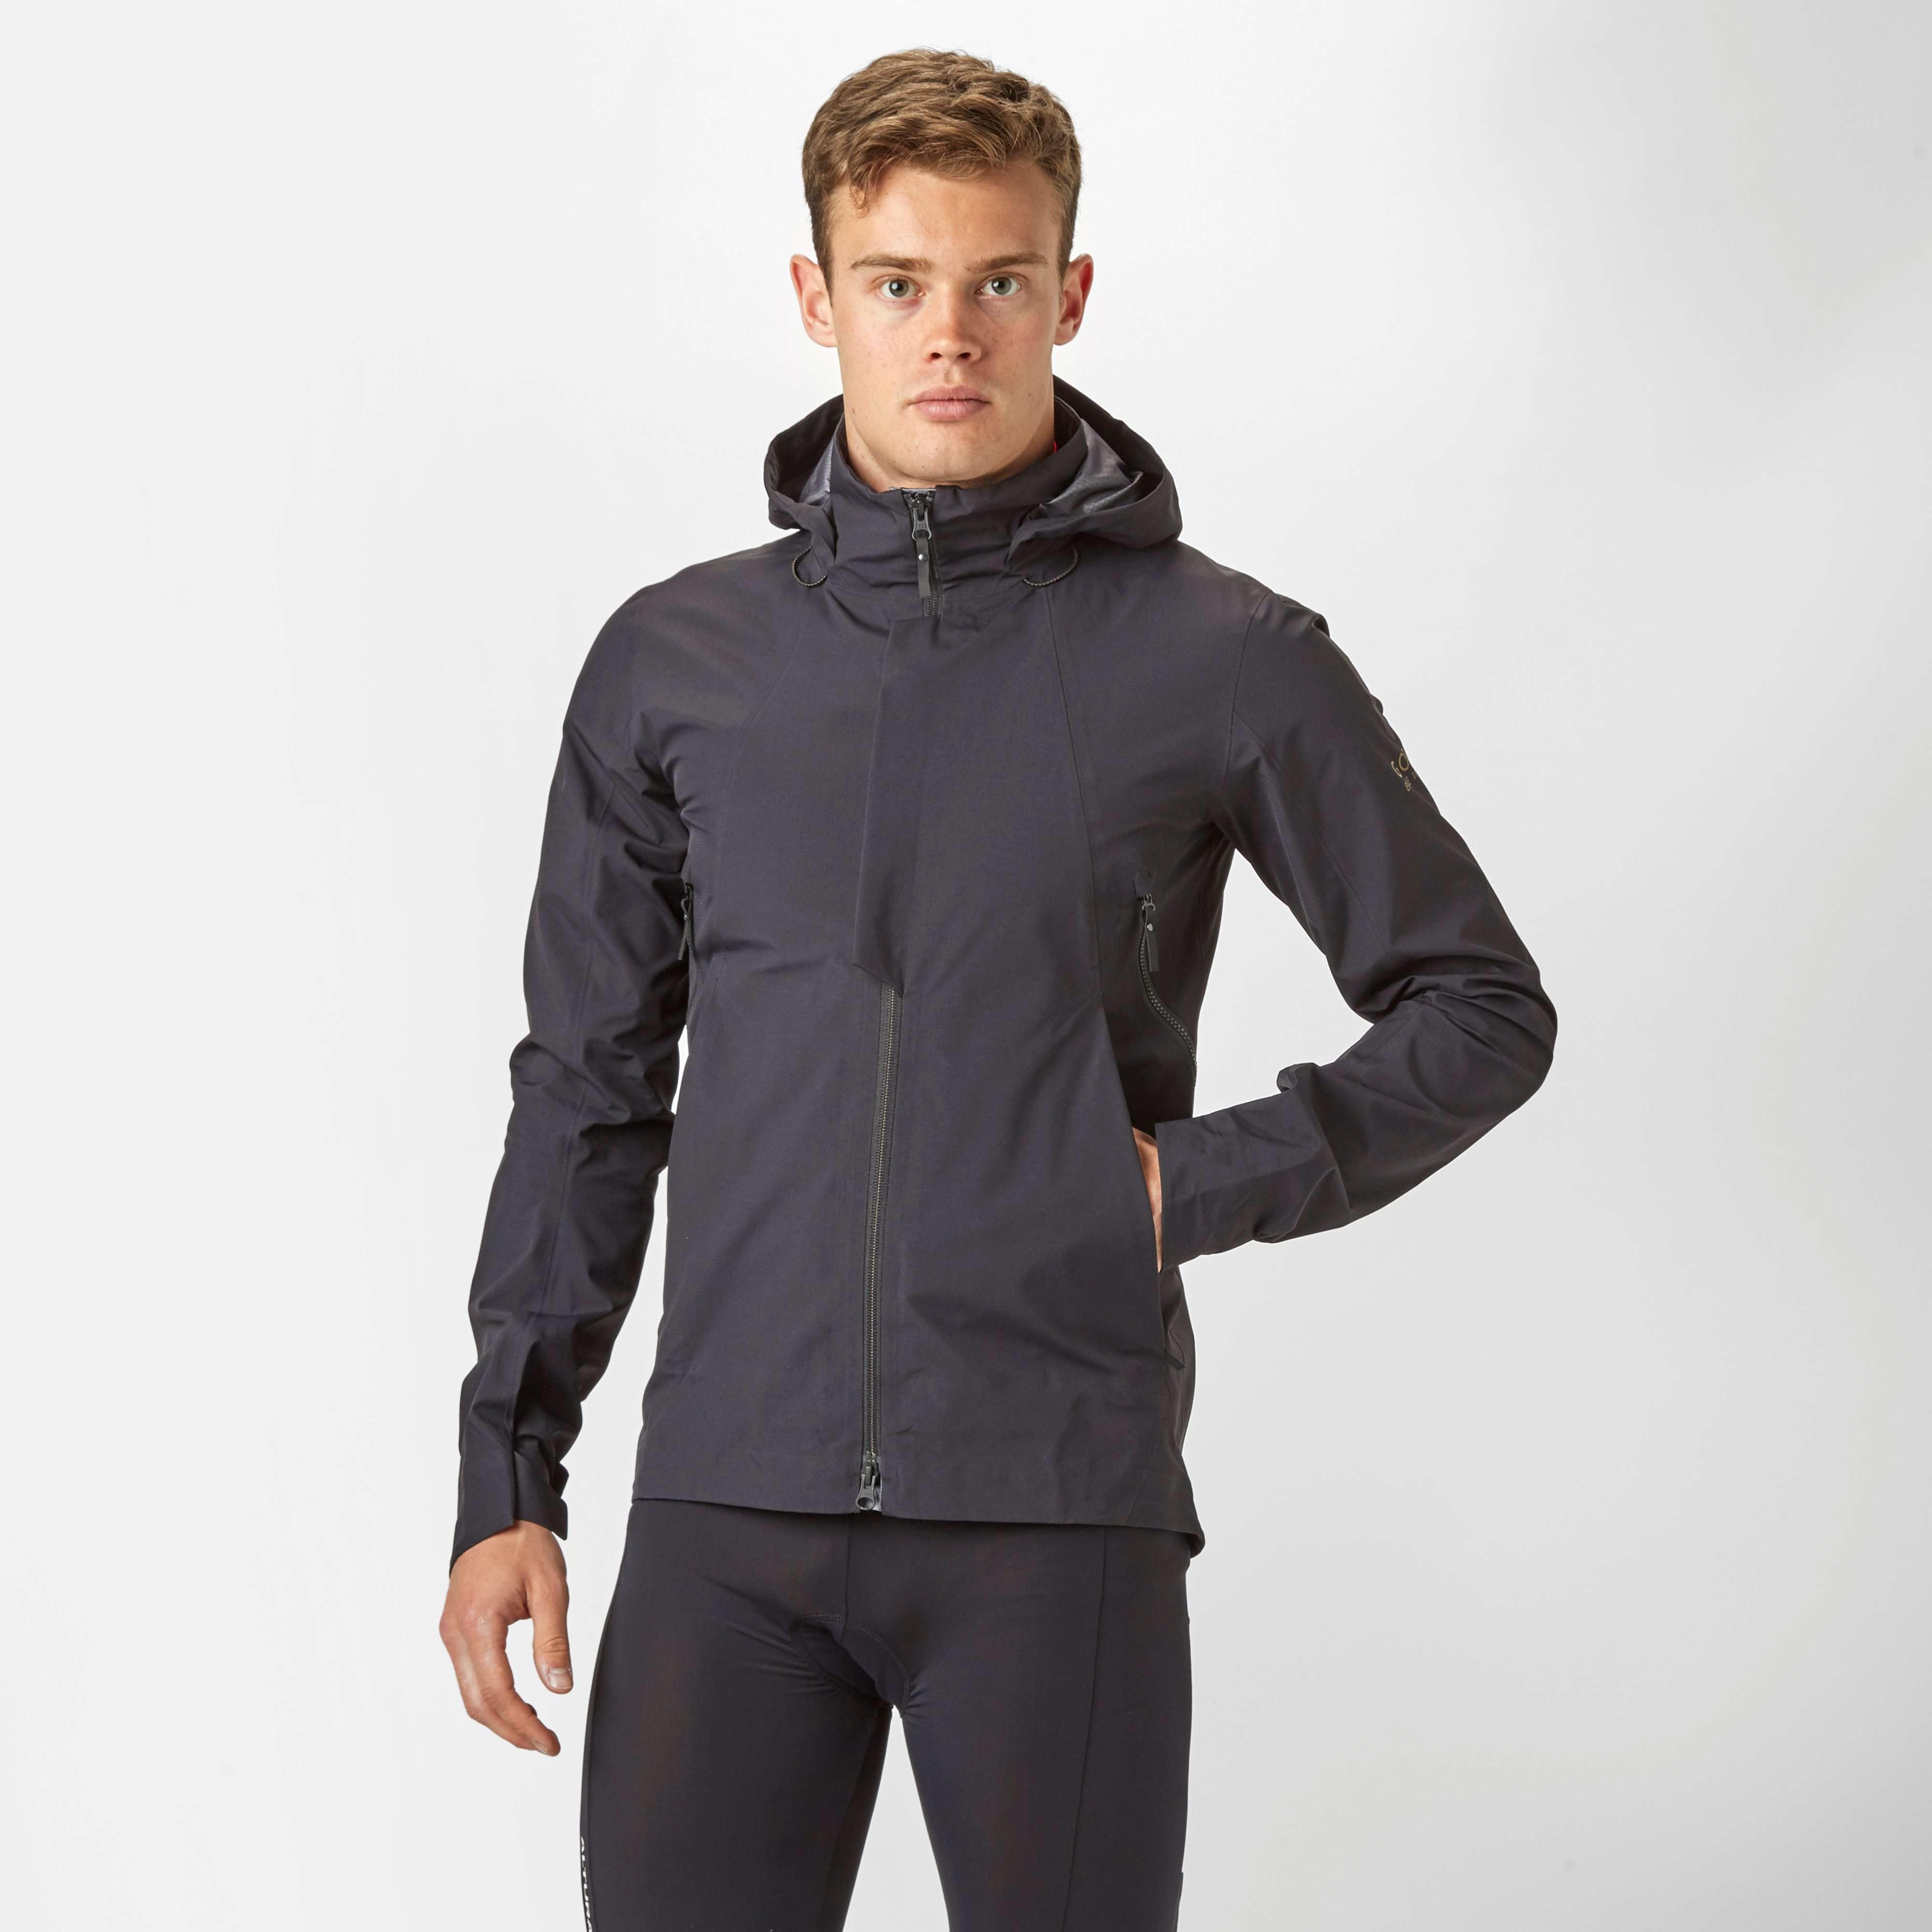 GORE Men's One Gore-Tex® Active Run Jacket